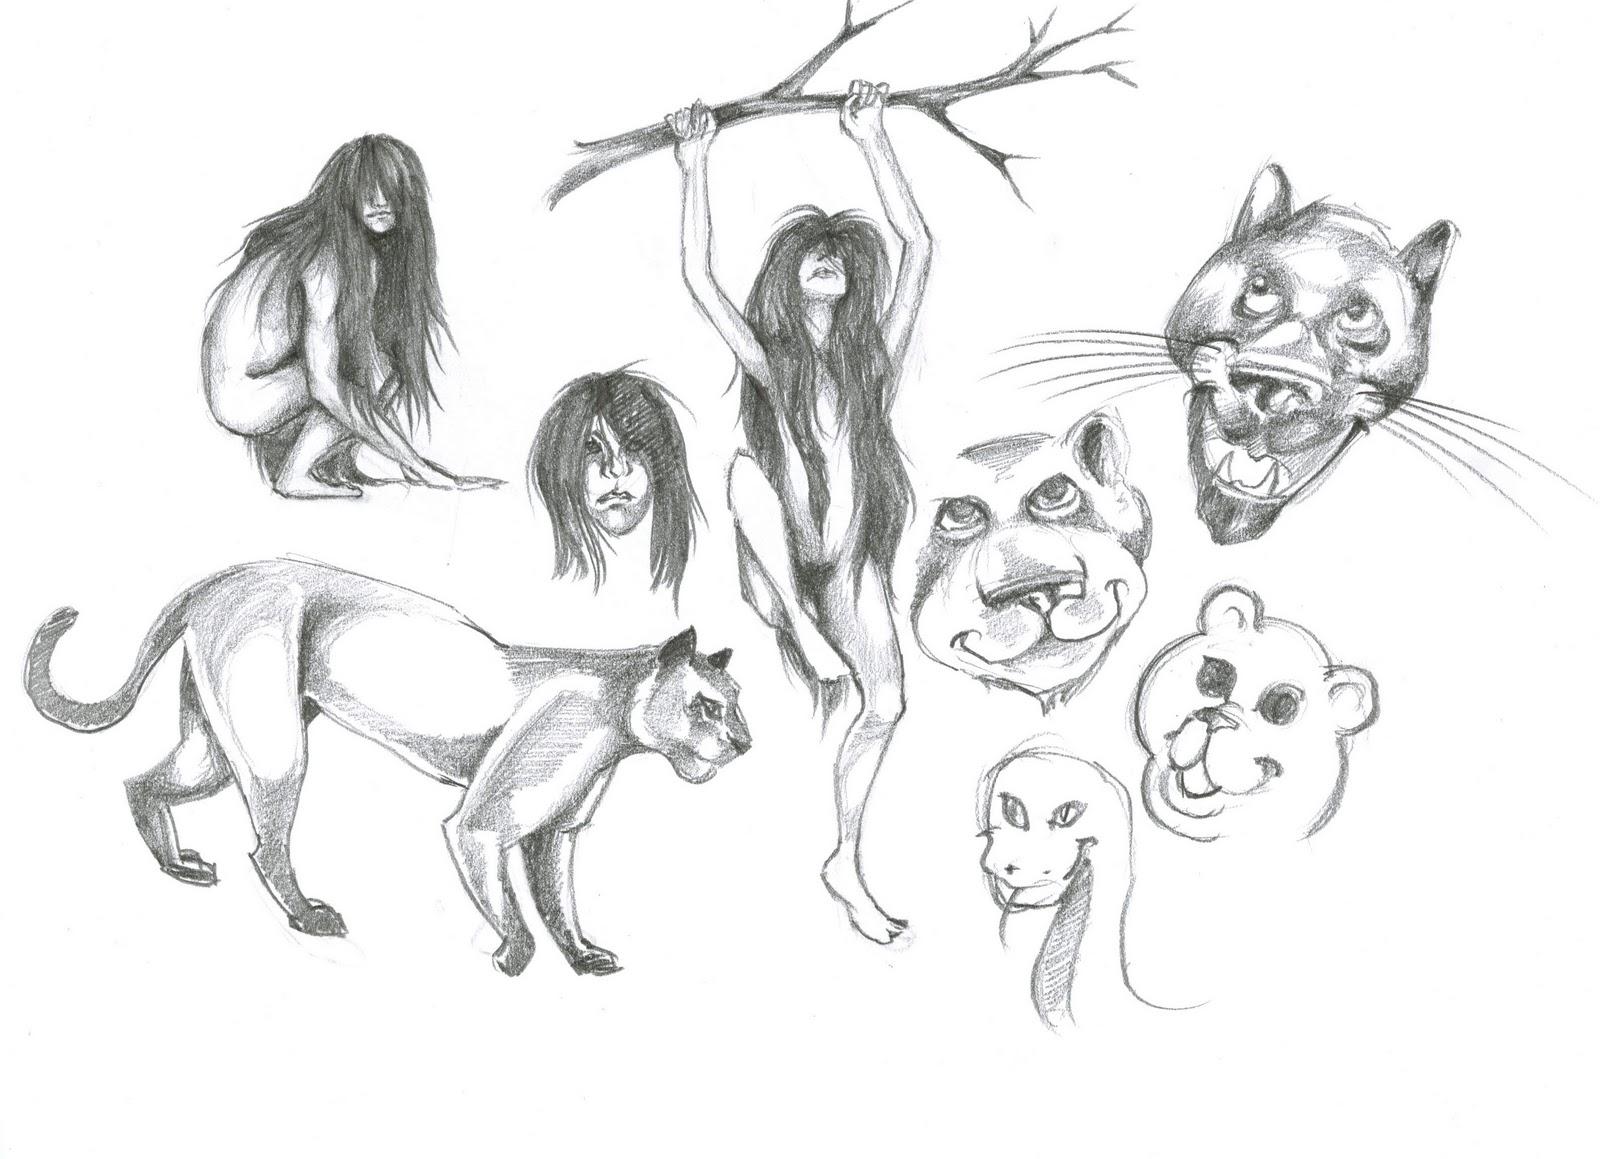 MICA 2011 - Spring - Concept Art More Jungle Book Sketches...